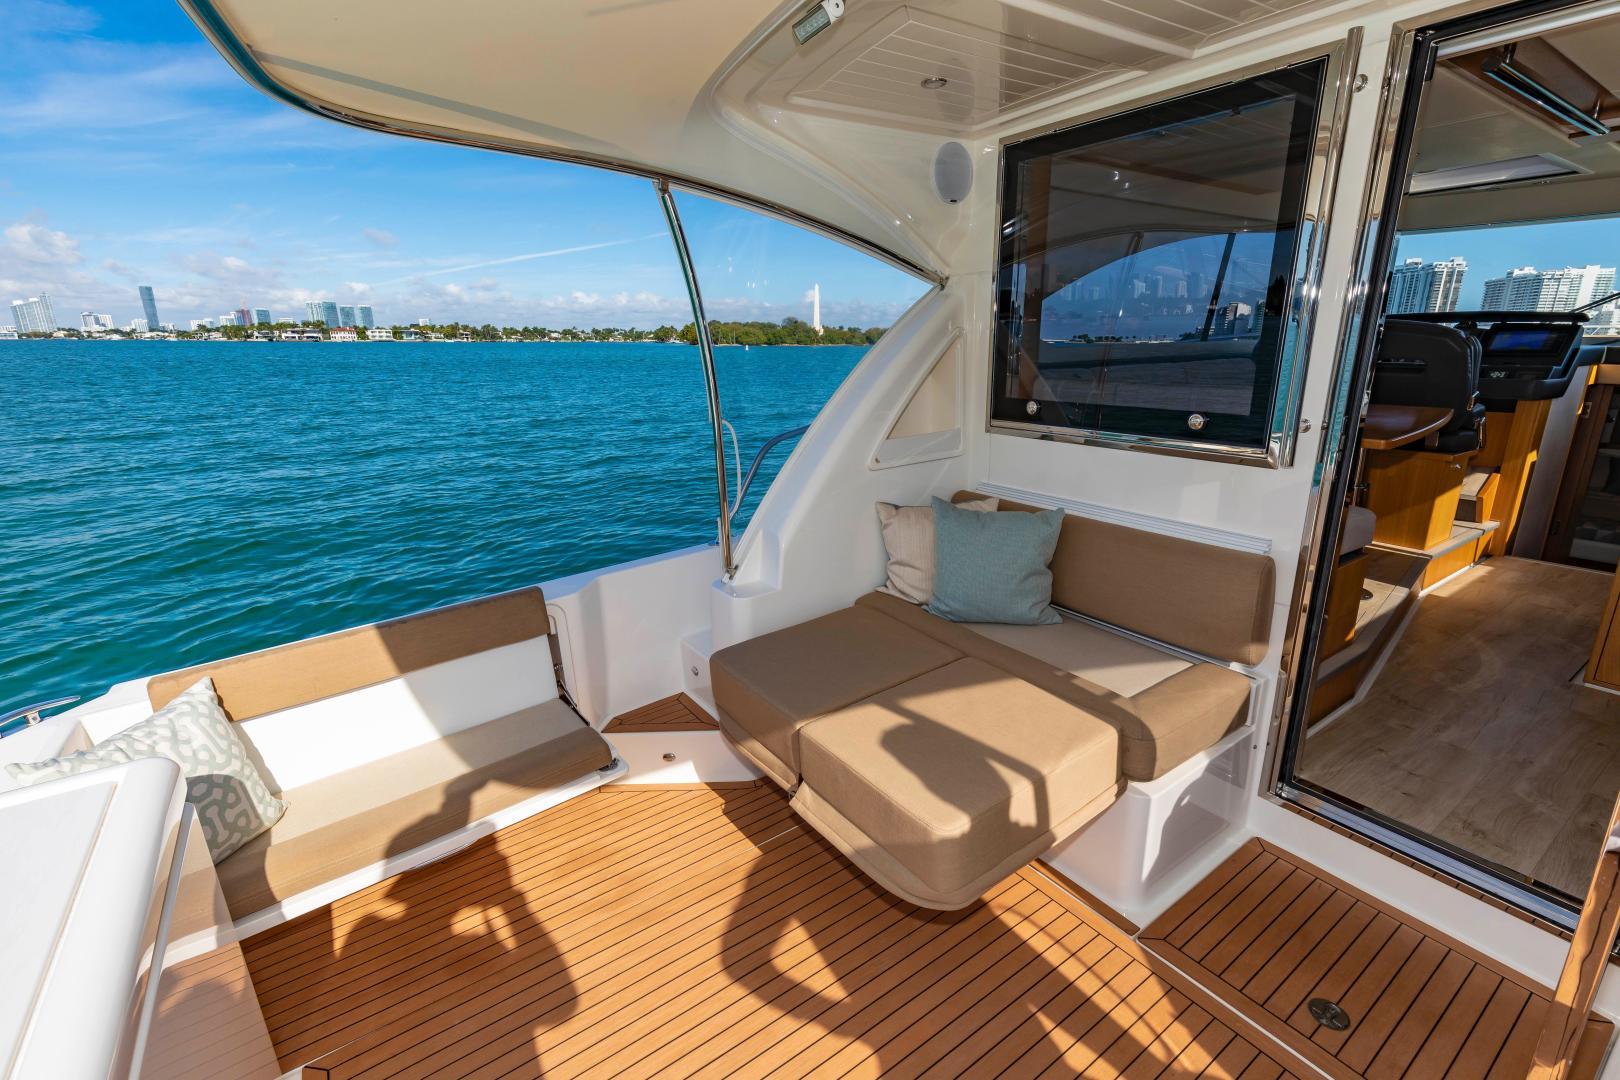 Riviera-395 SUV 2019-Ipanema Miami Beach-Florida-United States-1614885   Thumbnail